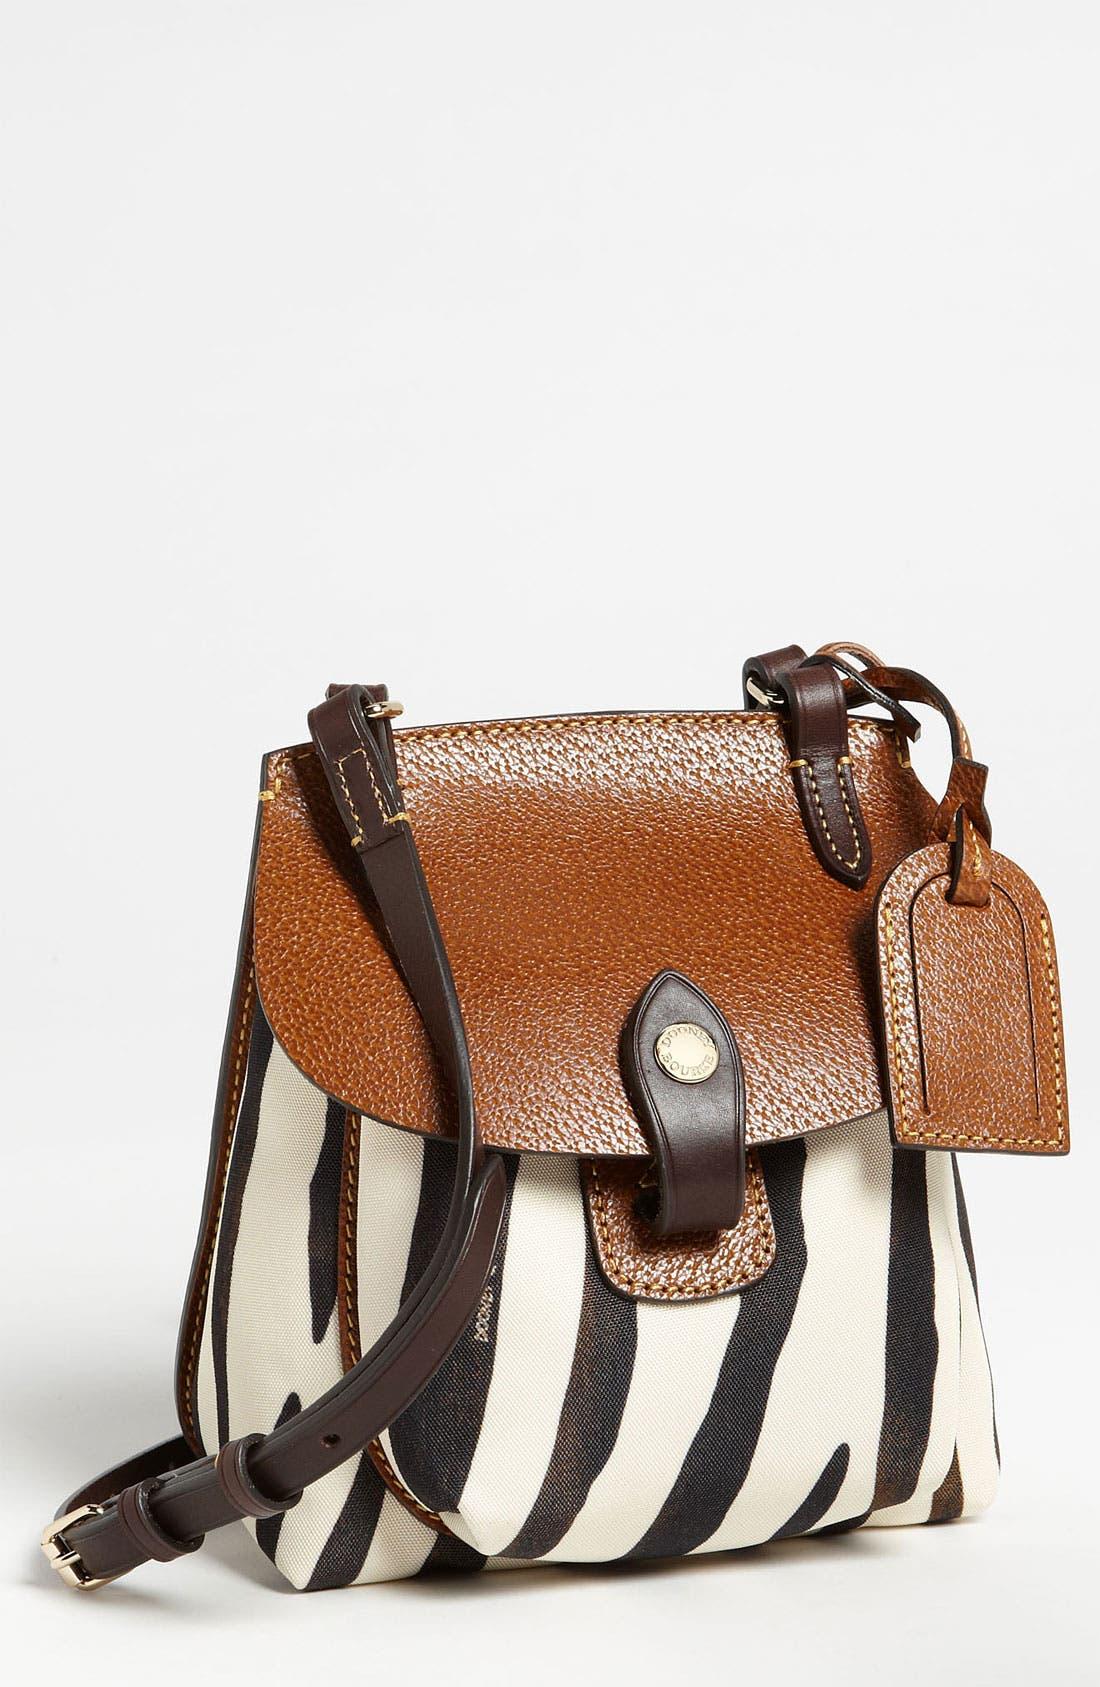 Alternate Image 1 Selected - Dooney & Bourke 'Pocket - Mini' Crossbody Bag